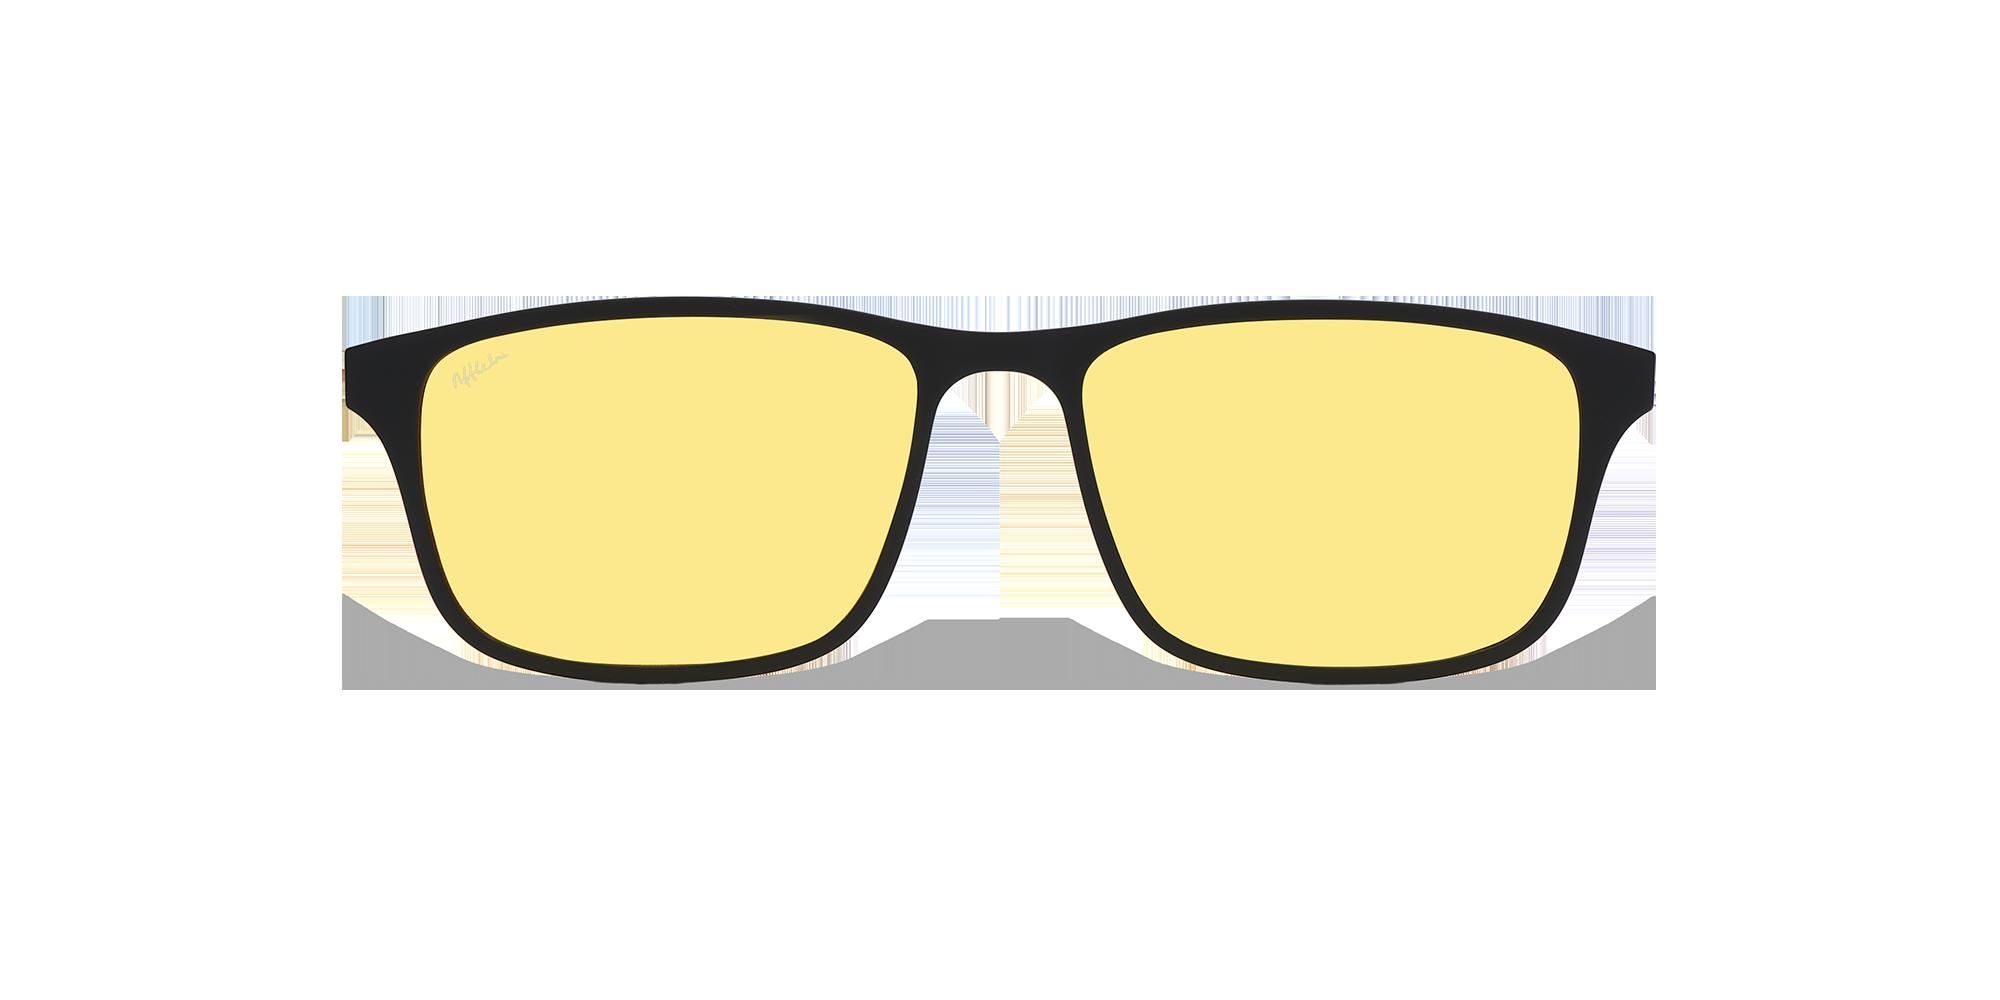 afflelou/france/products/smart_clip/clips_glasses/TMK41YEBK015416.png